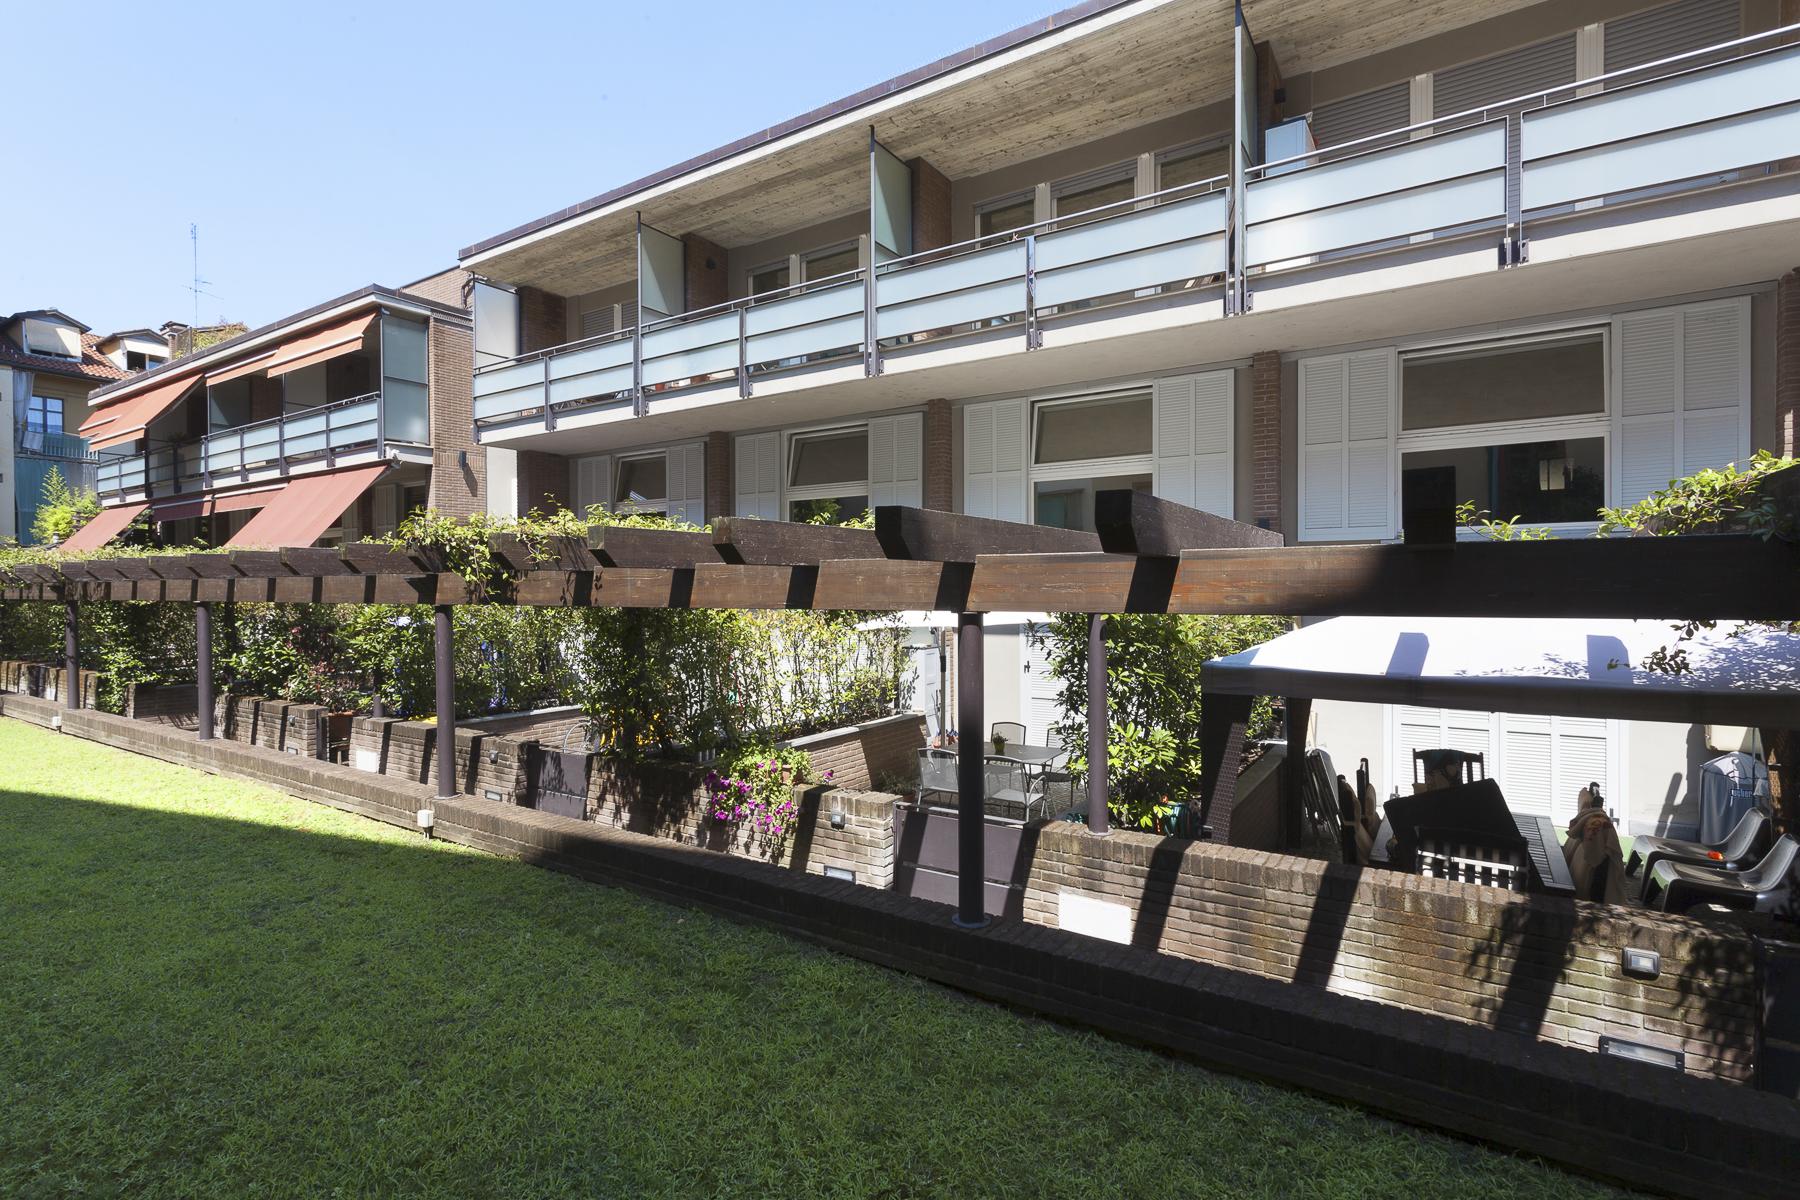 Appartement pour l à louer à Apartment modernly furnished Via Sciolze Turin, Turin 10132 Italie